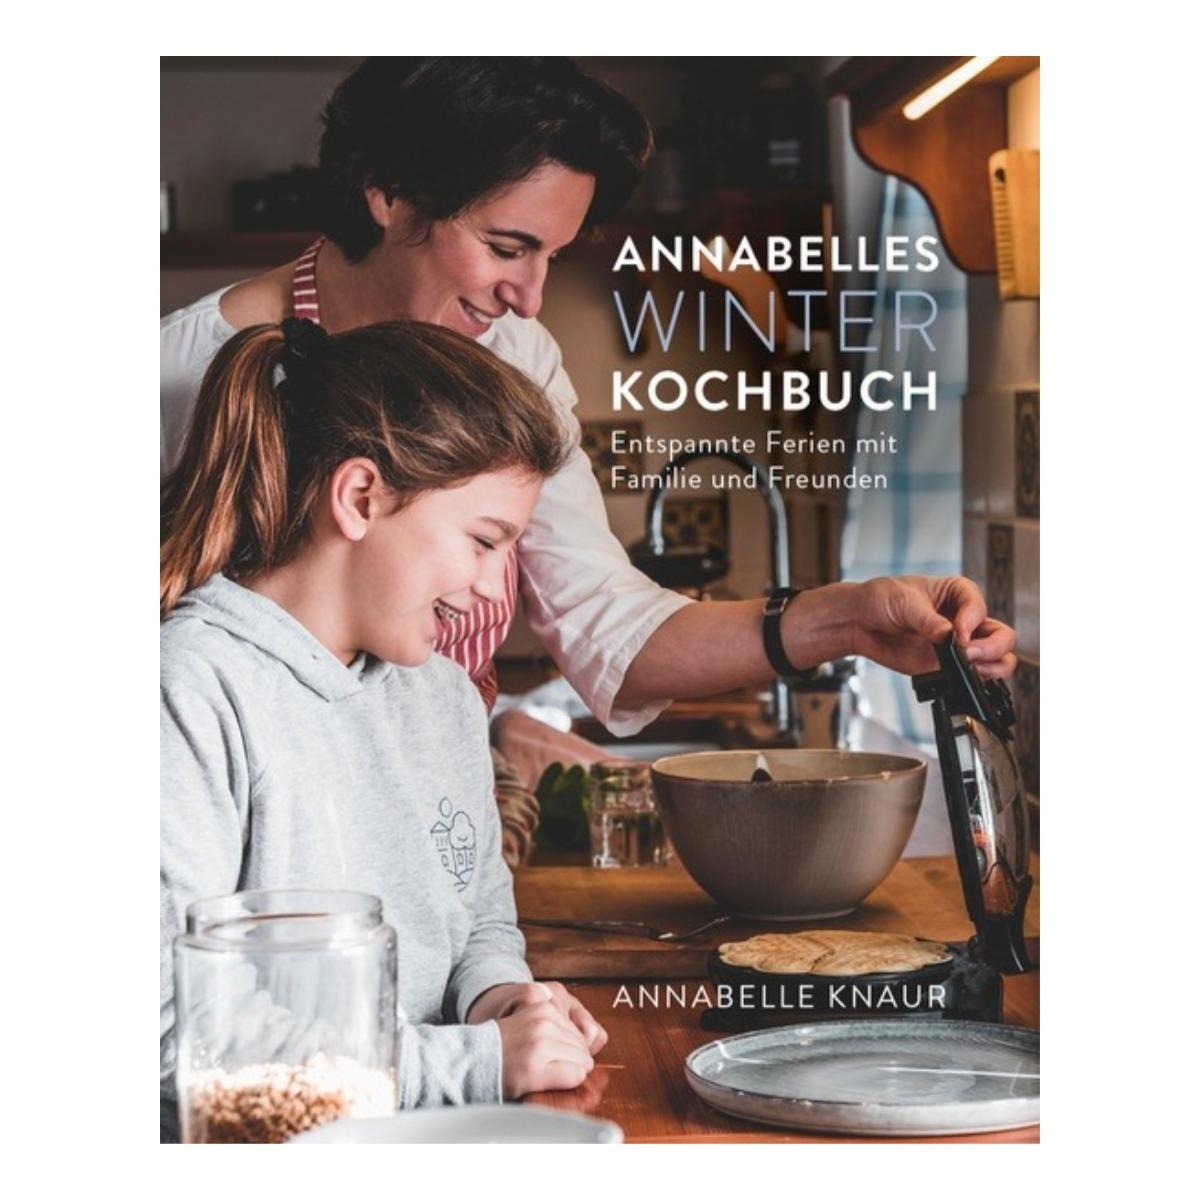 Annabellas Winterkochbuch